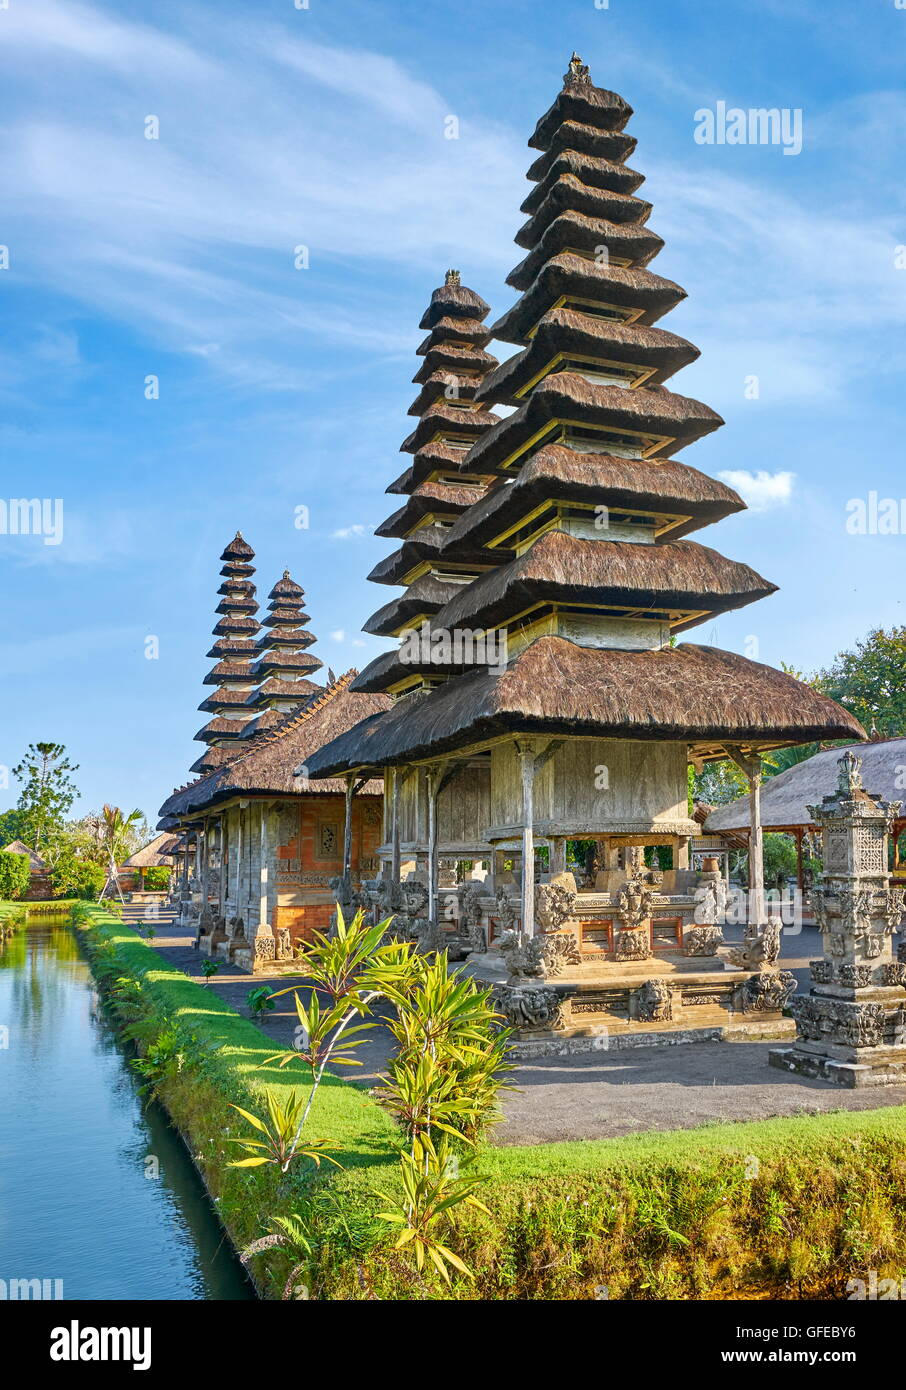 Royal Temple of Mengwi, Pura Taman Ayun, Bali, Indonesia - Stock Image